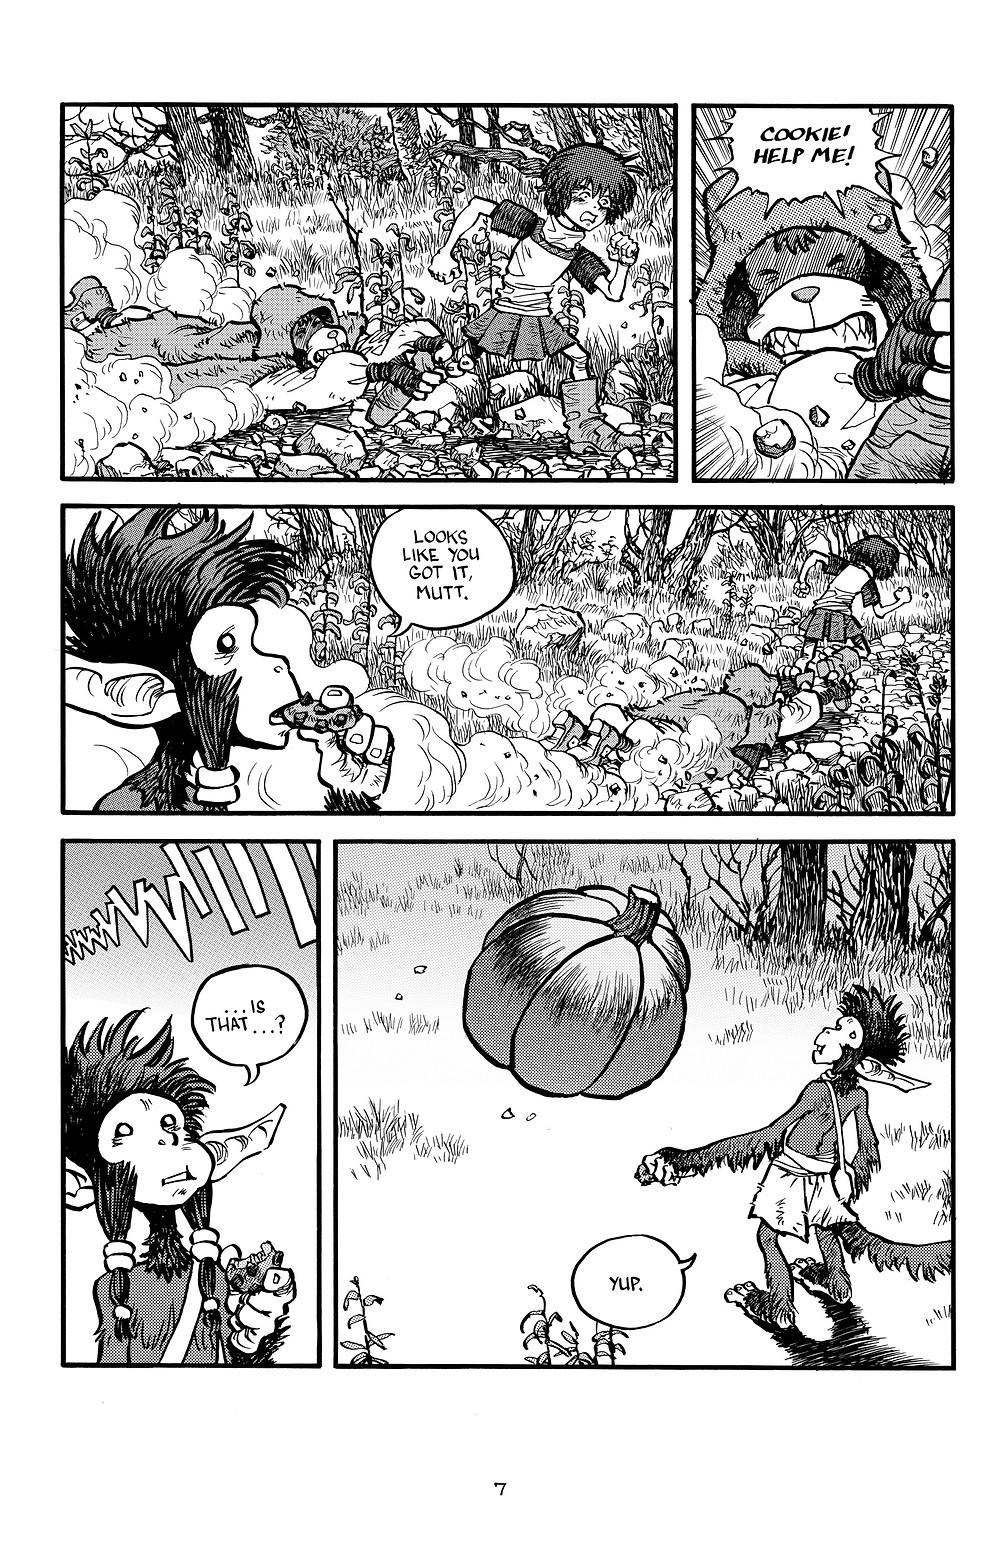 Cookie and the Kid #3, page 7, Antartic Press, Kosakowski